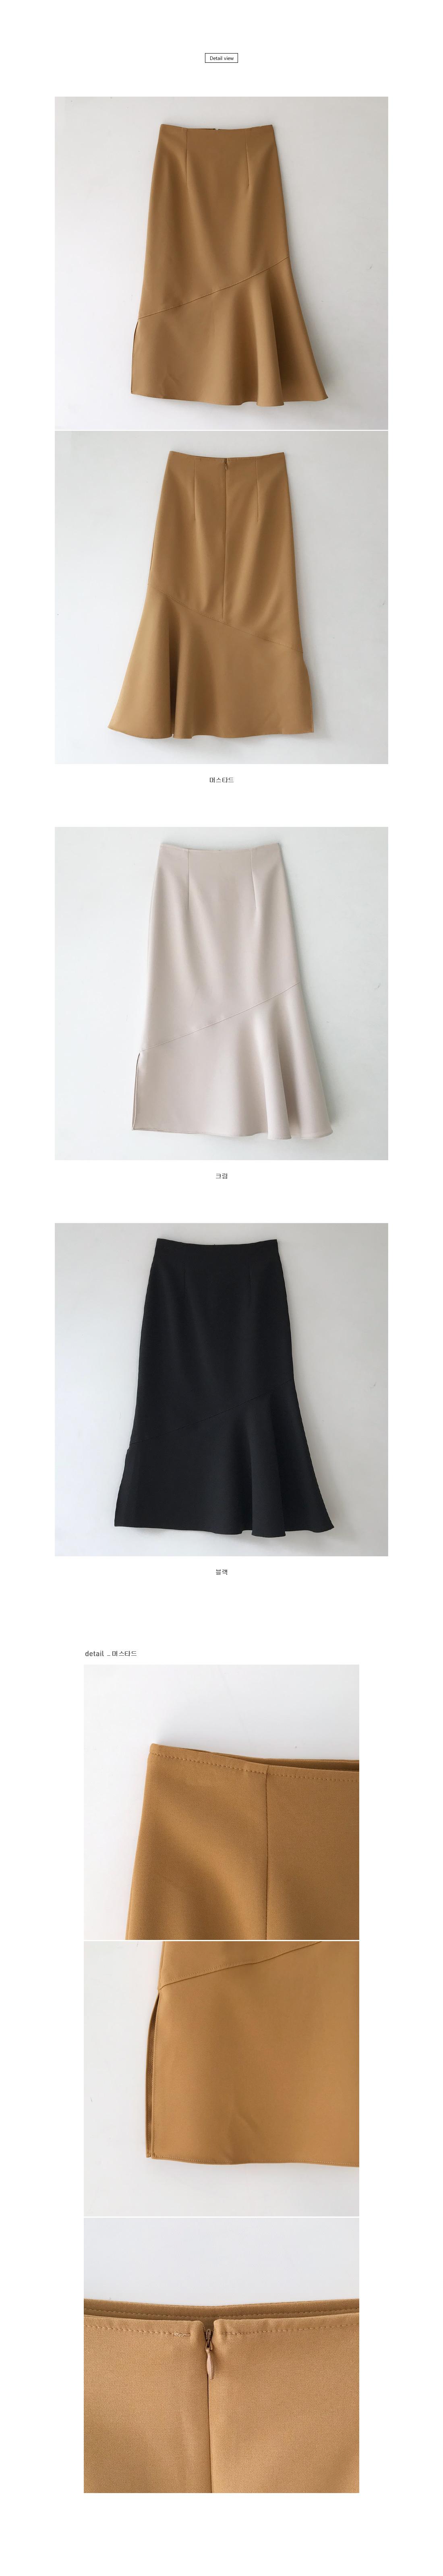 Kishuyuu frill long skirt - Black S ships same day